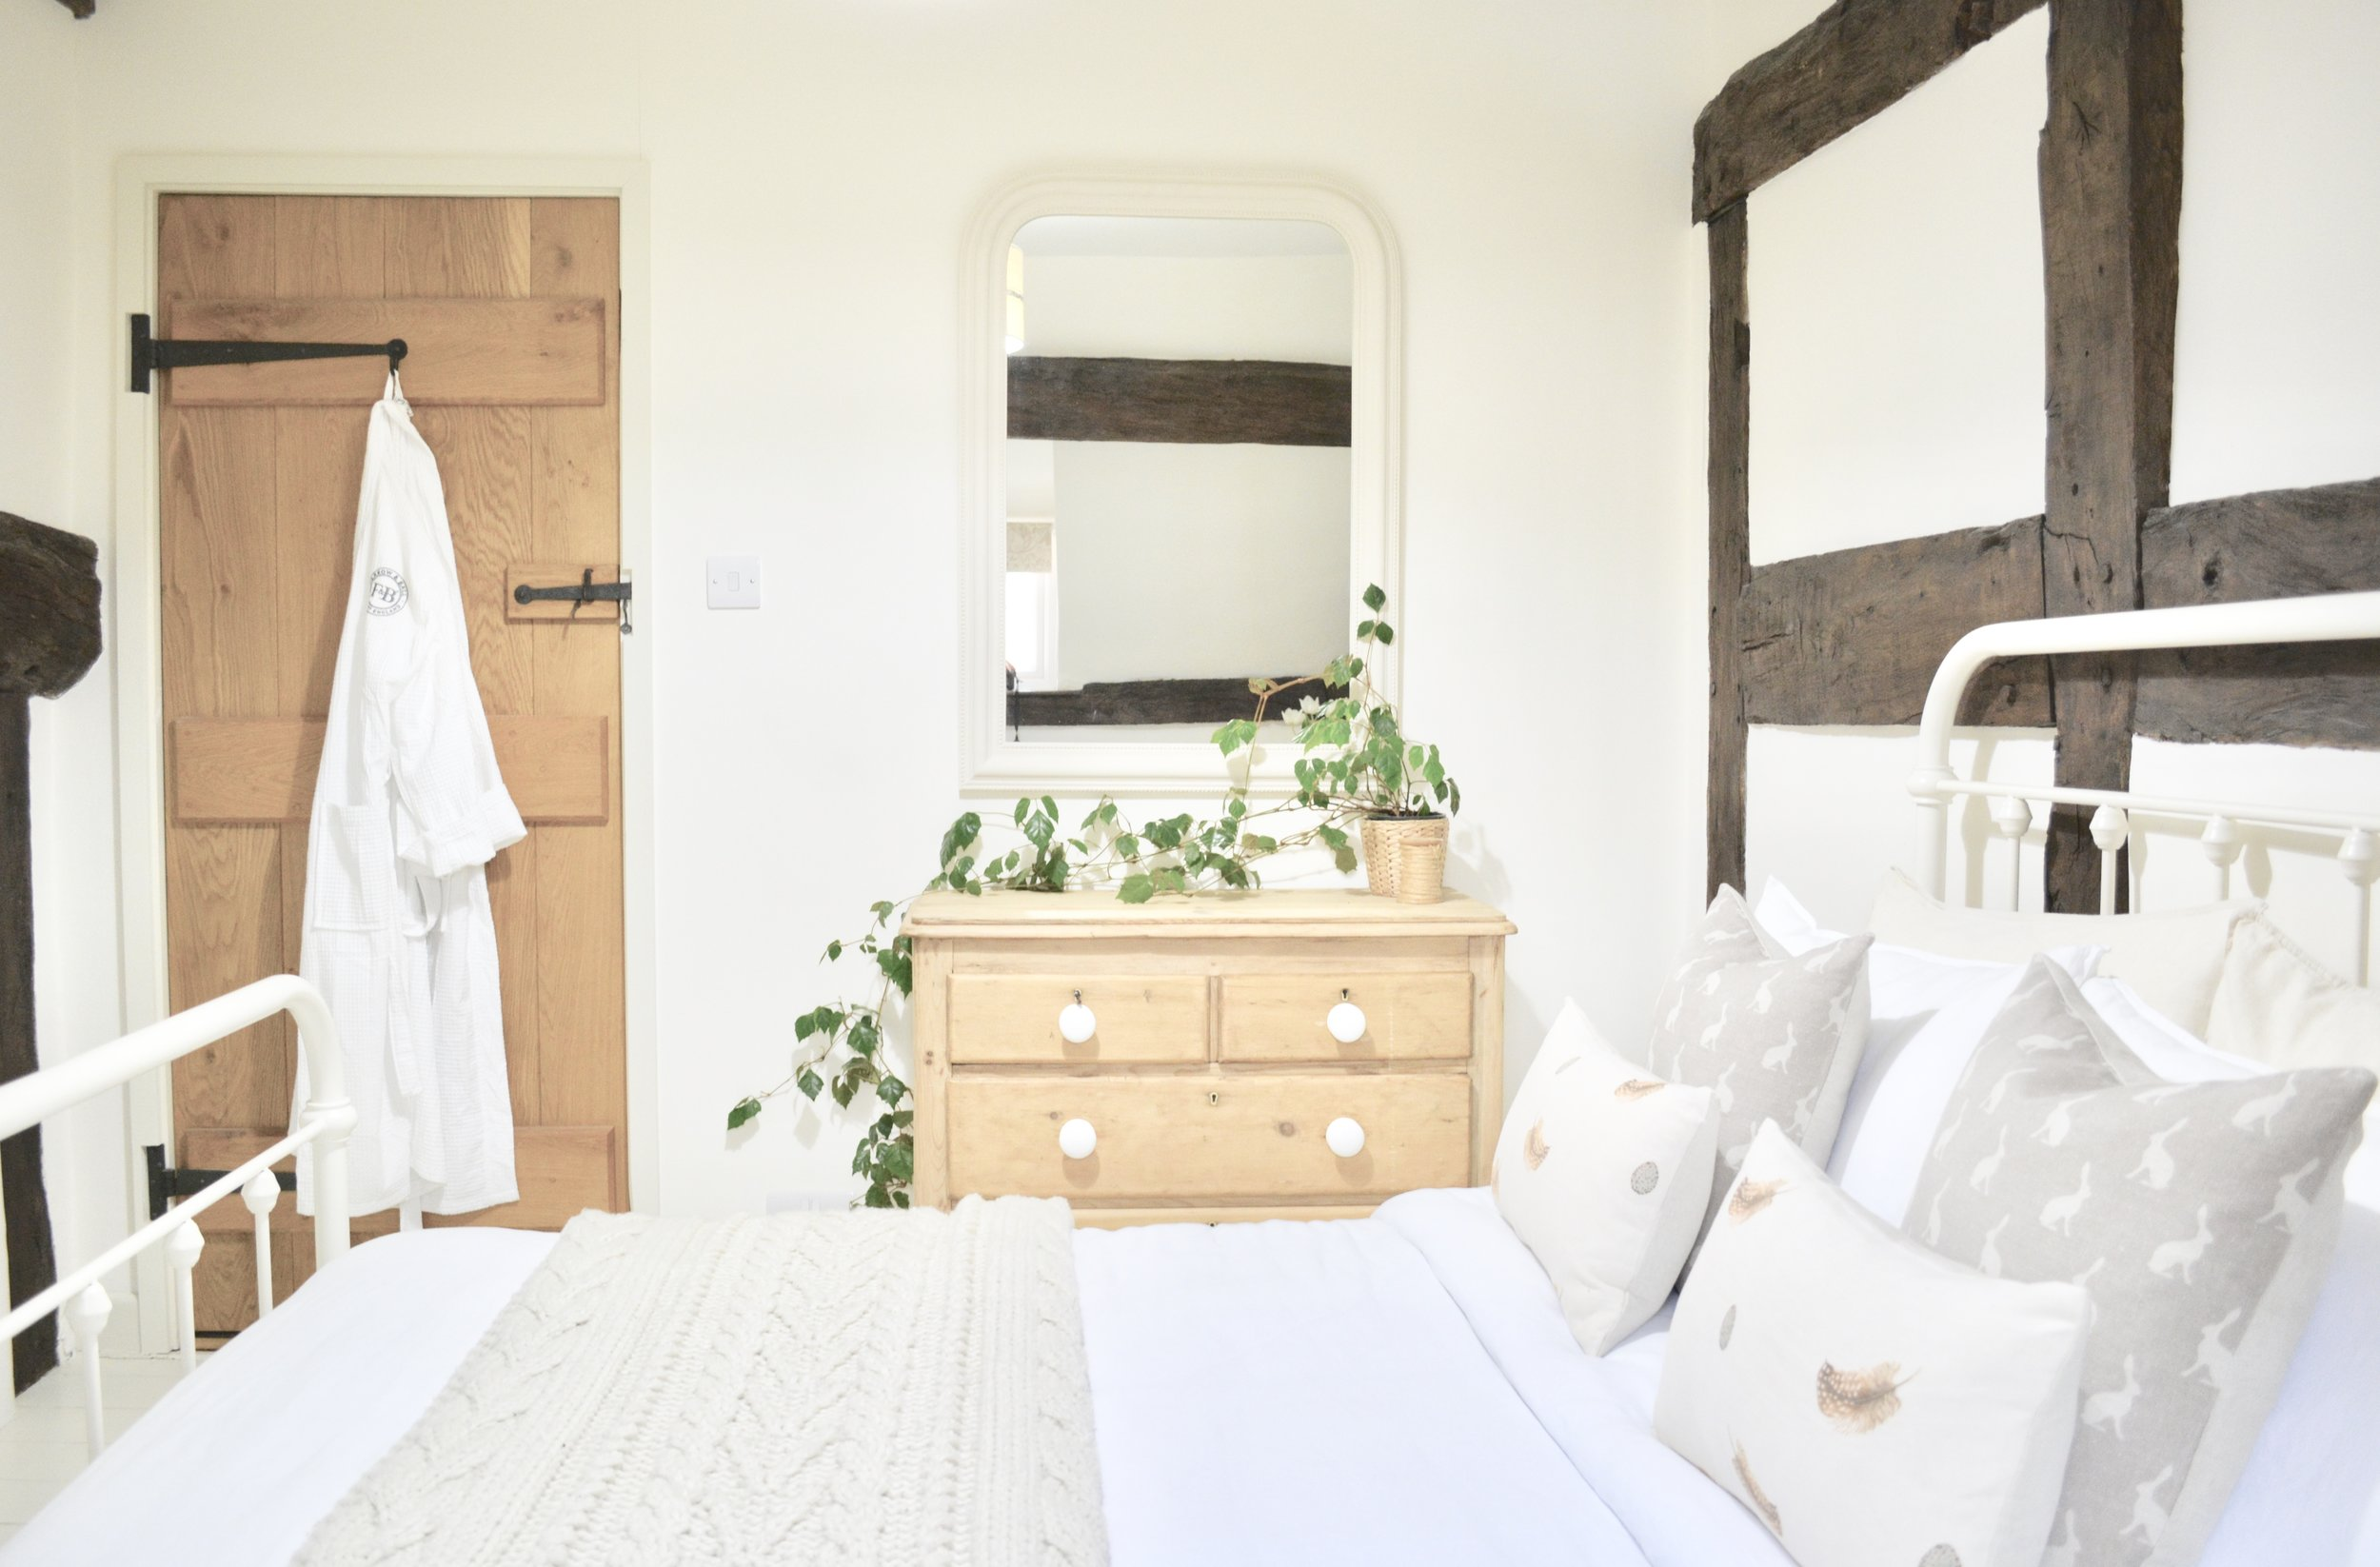 Black & White Cottage Bedroom Designed by www.hlinteriors.co.uk22.jpeg